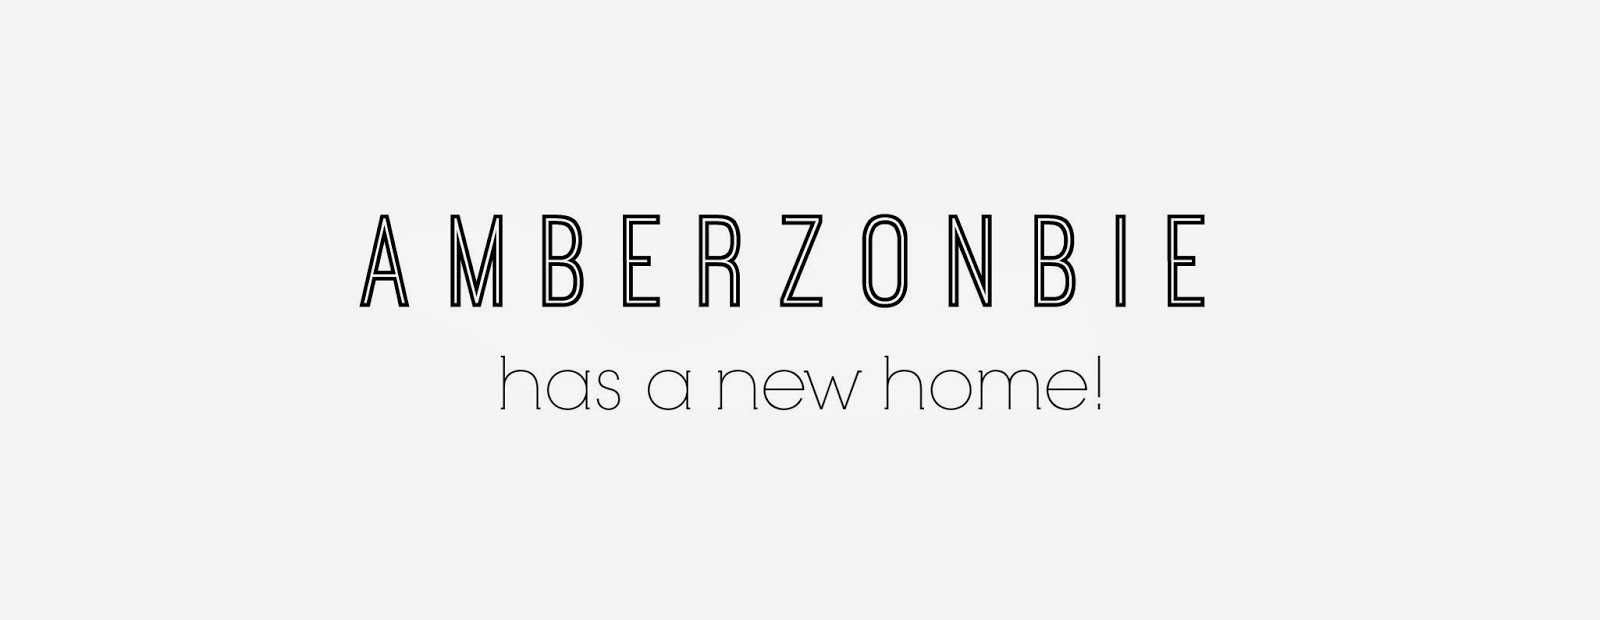 amberZon.com